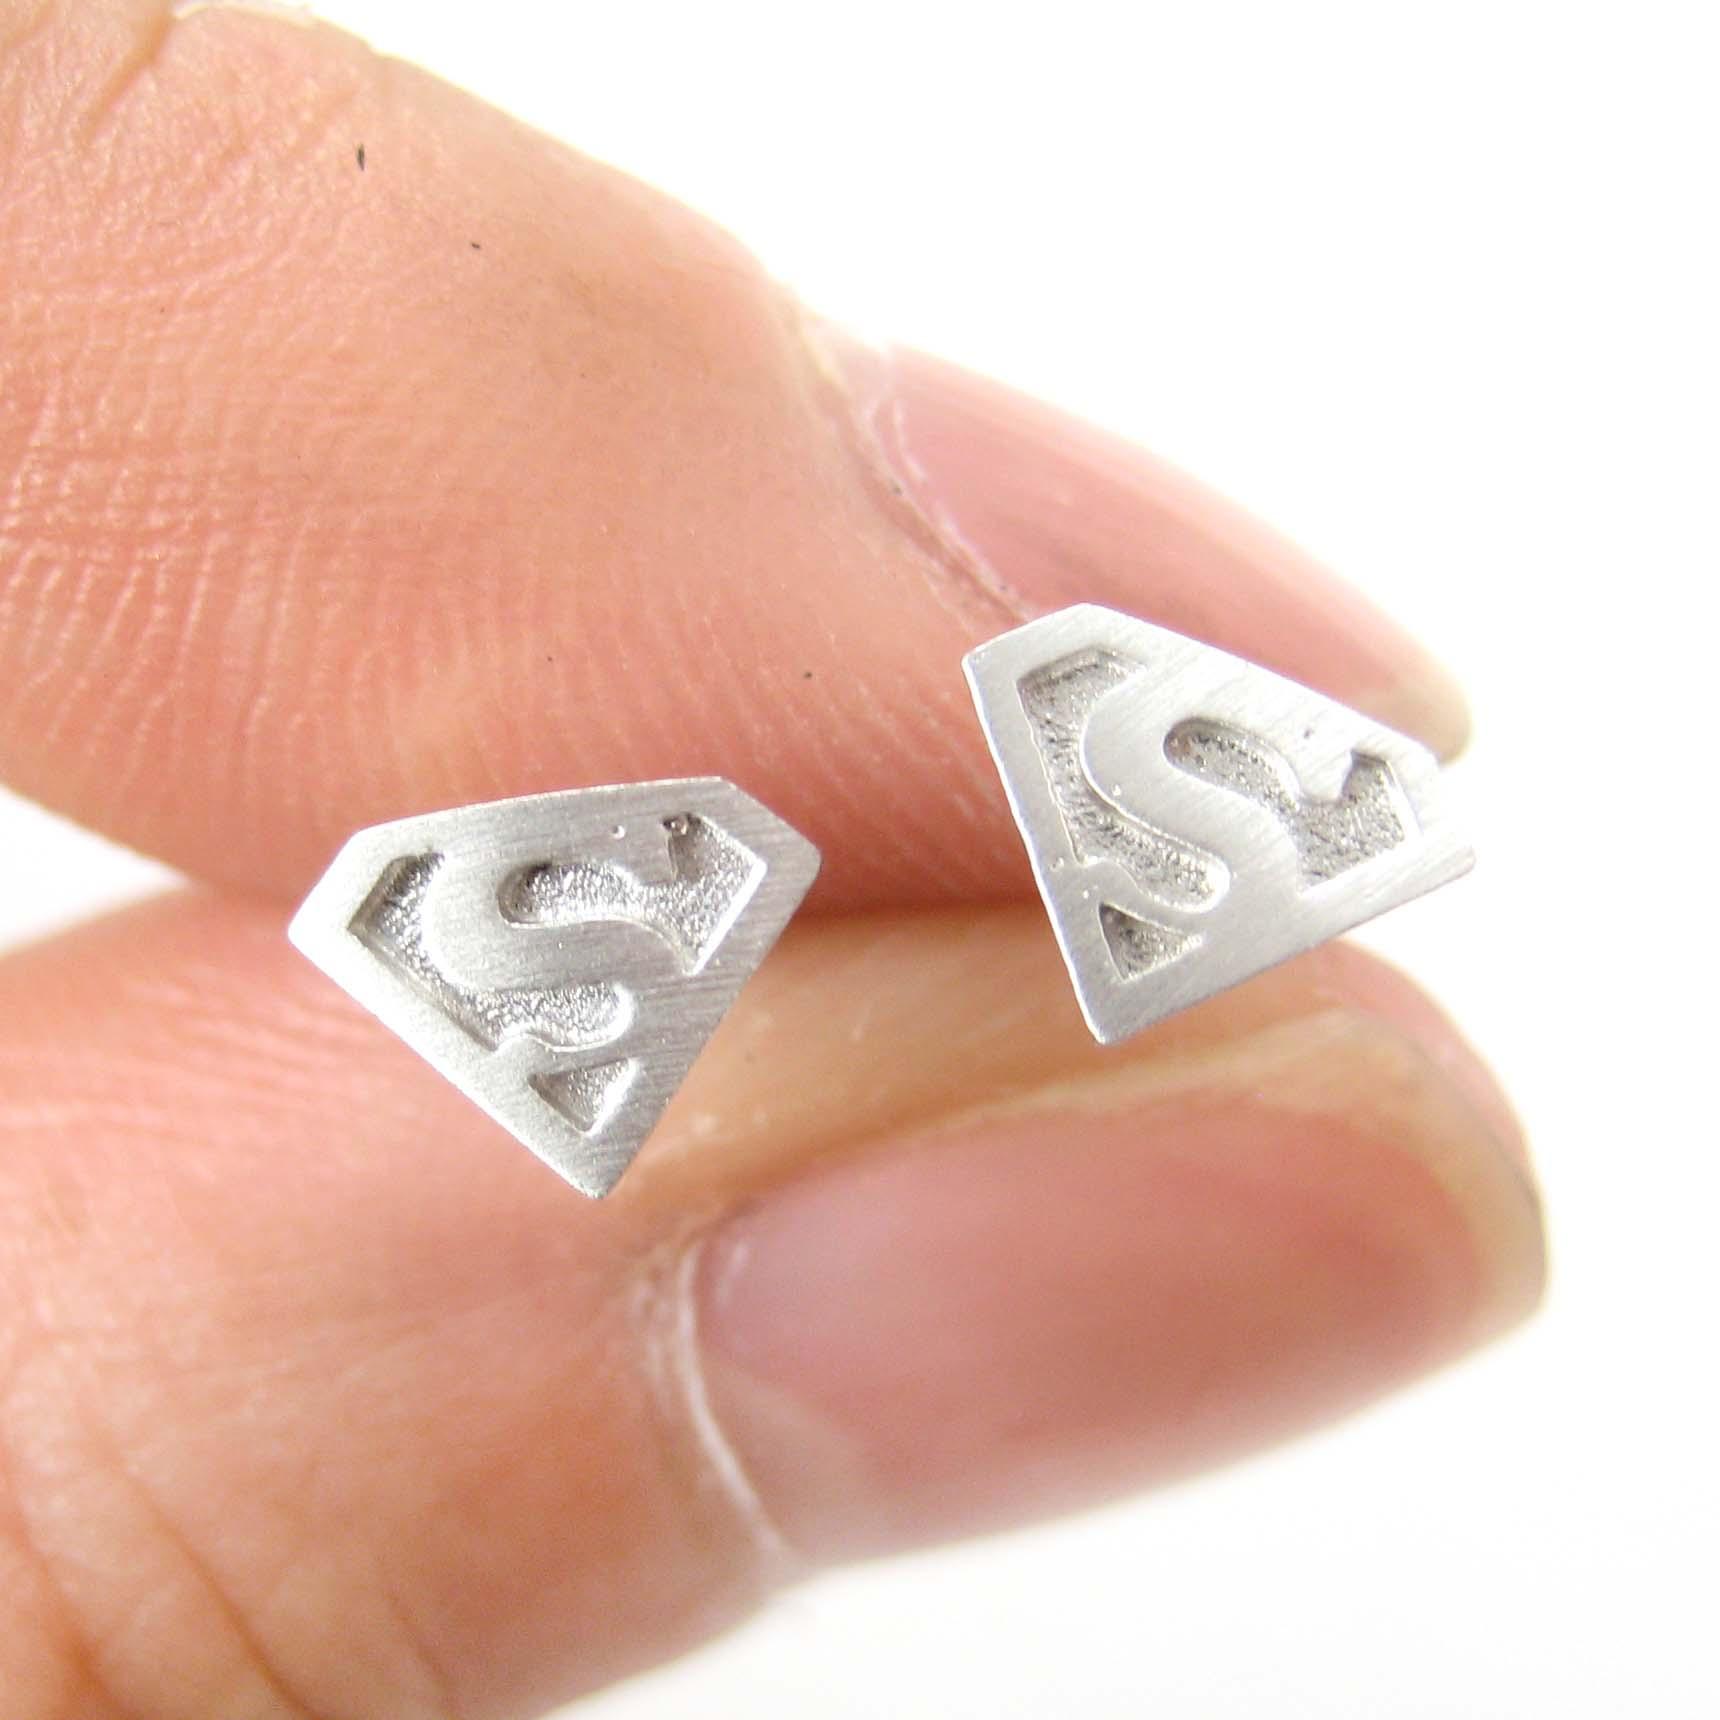 small superman logo symbol stud earrings in silver